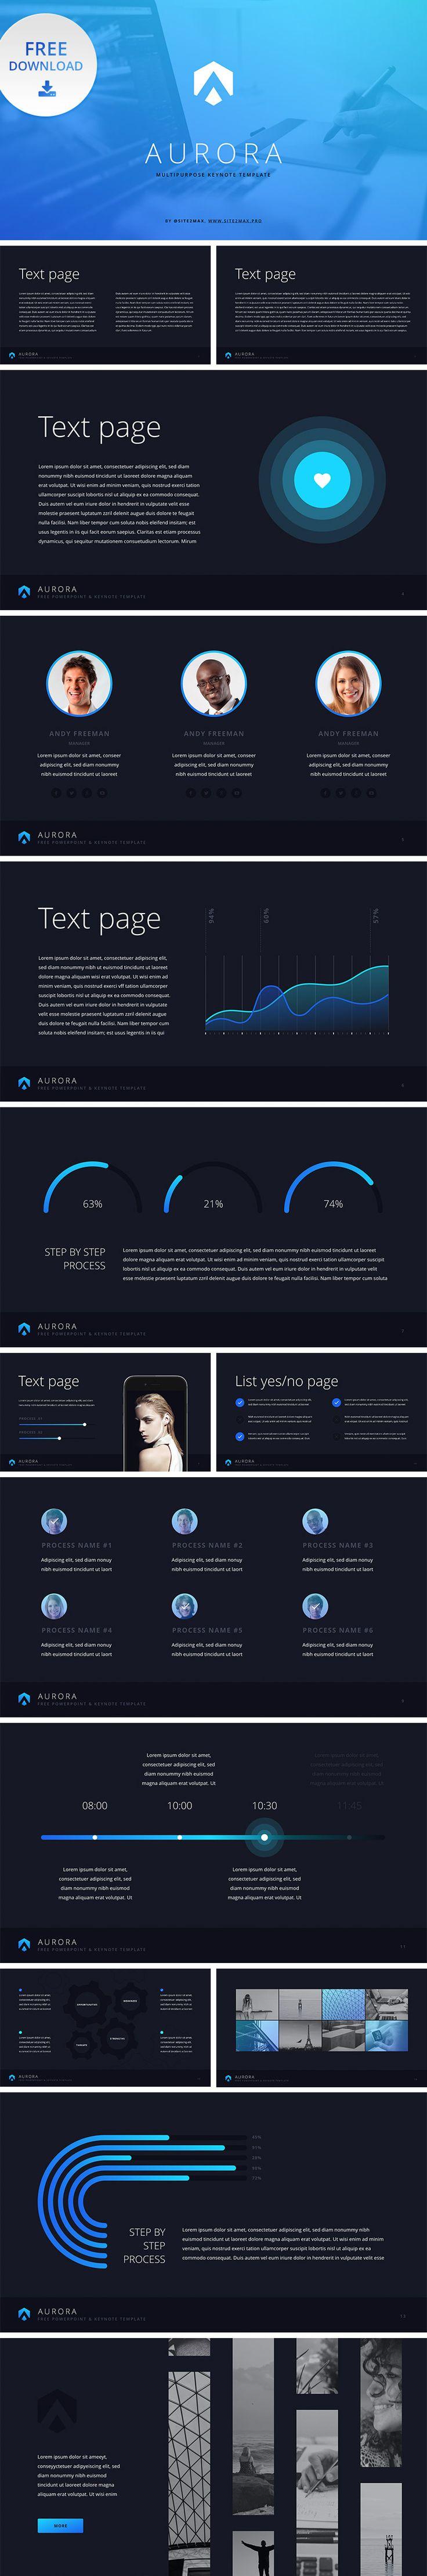 Free KeyNote Template Download: https://hislide.io/product/aurora-free-key-template-blue/ #free #key #keynote #design #download #blue #infographic #marketing #presentation